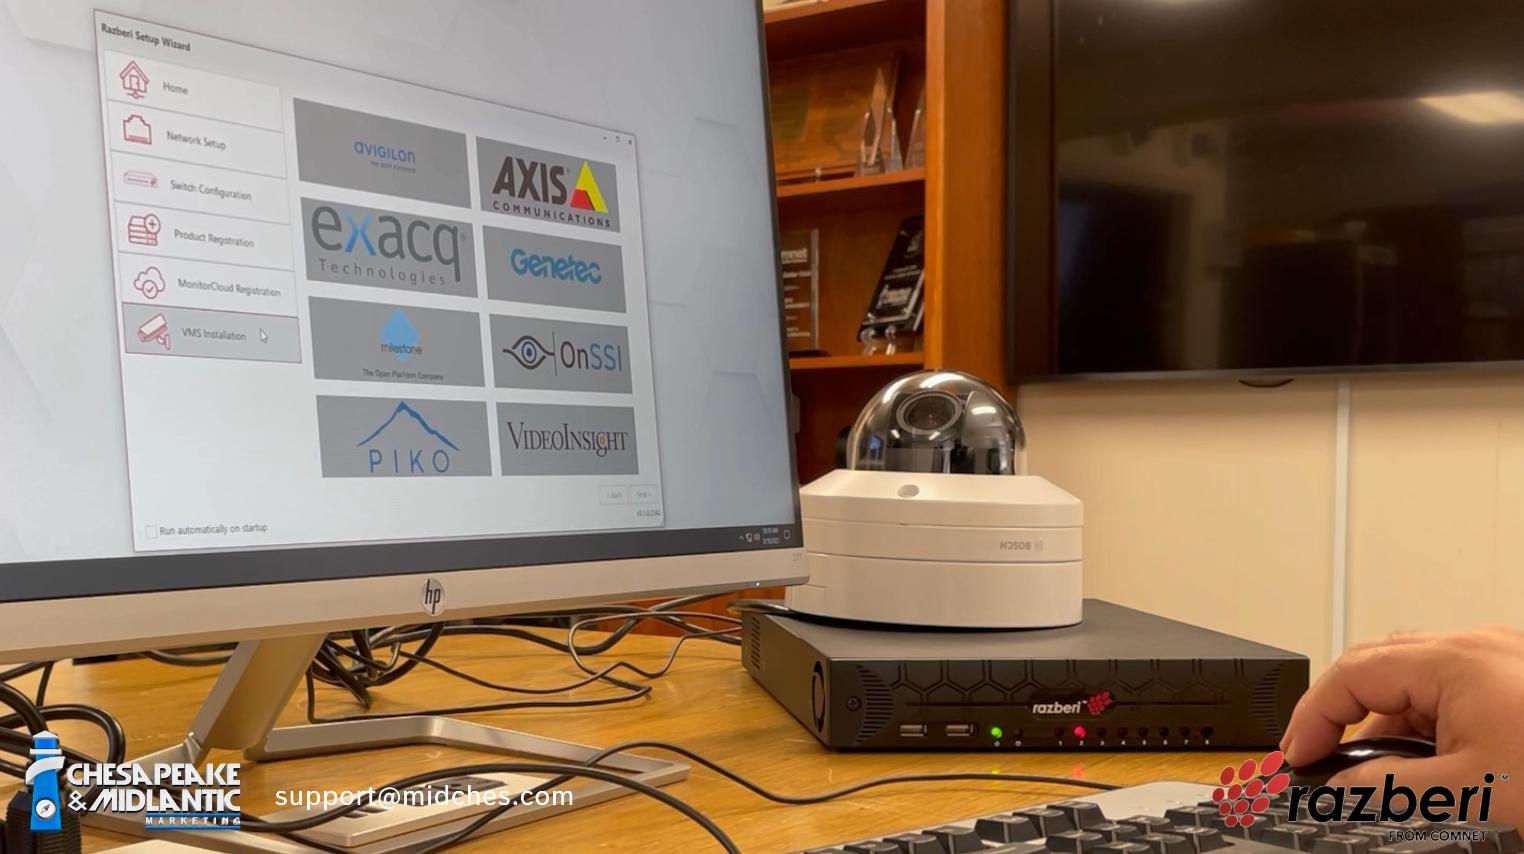 Razberi VMS choice screen with Bosch camera image - small